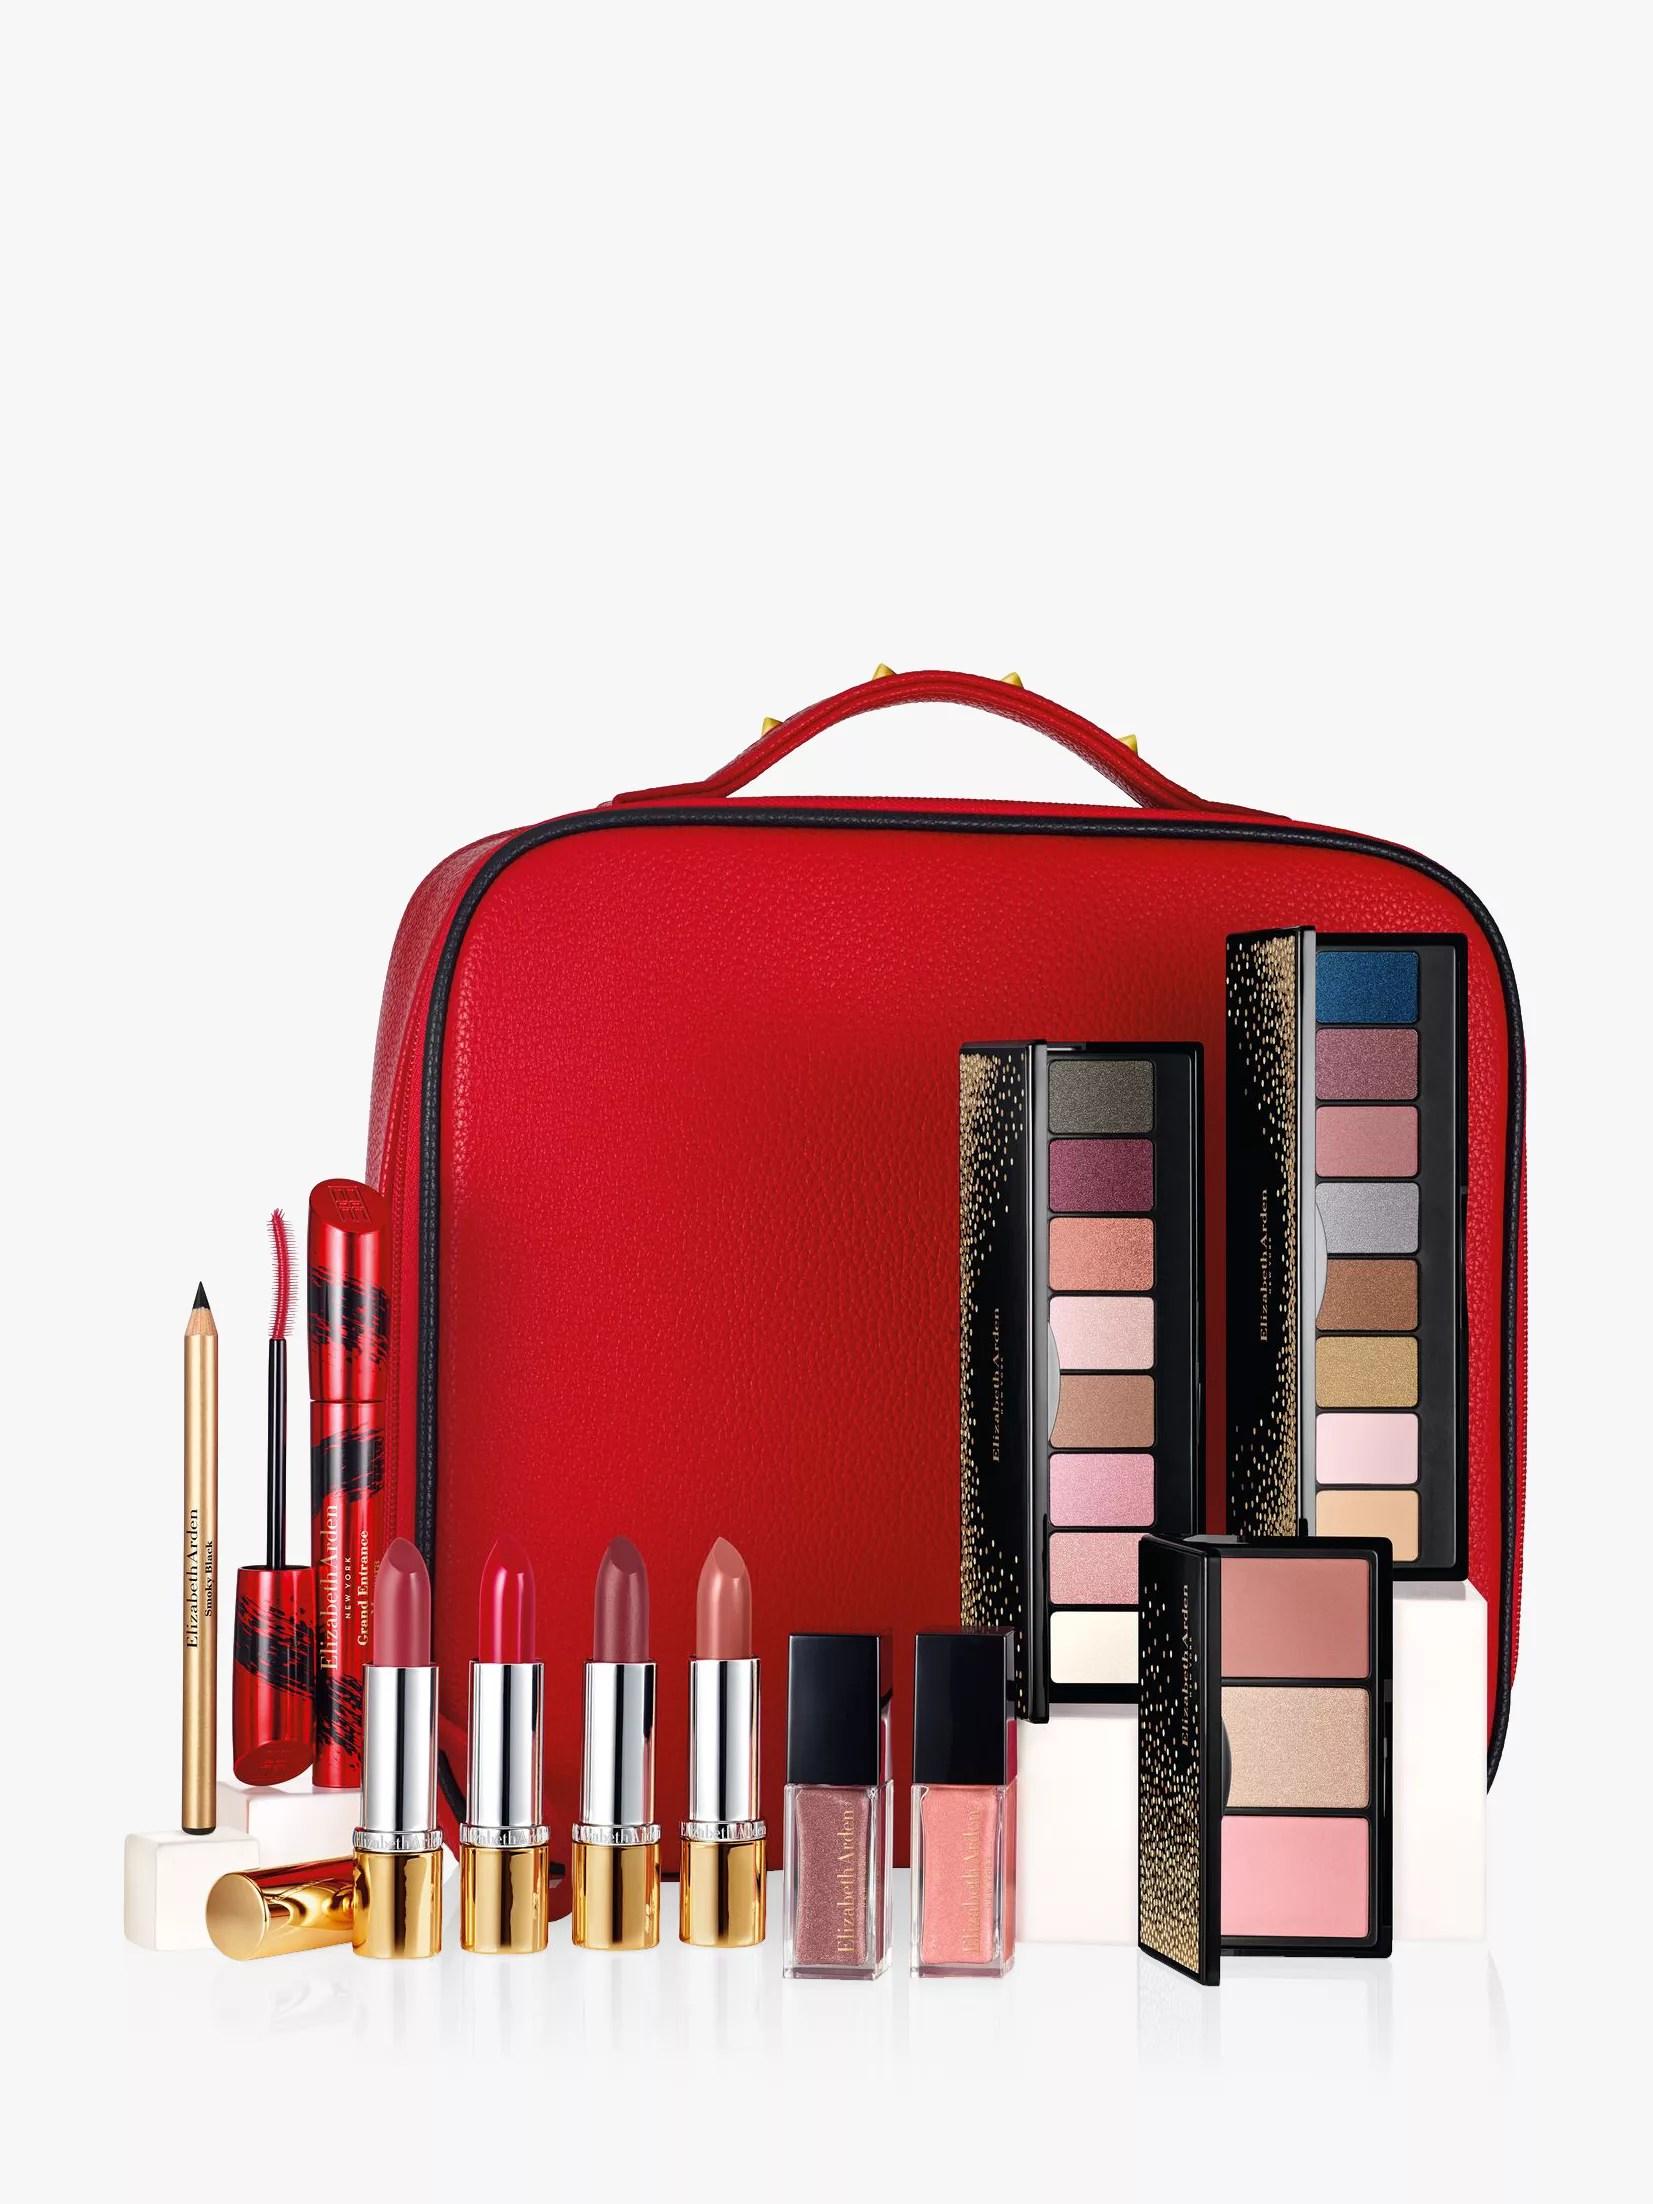 elizabeth arden makeup - HD1440×1920